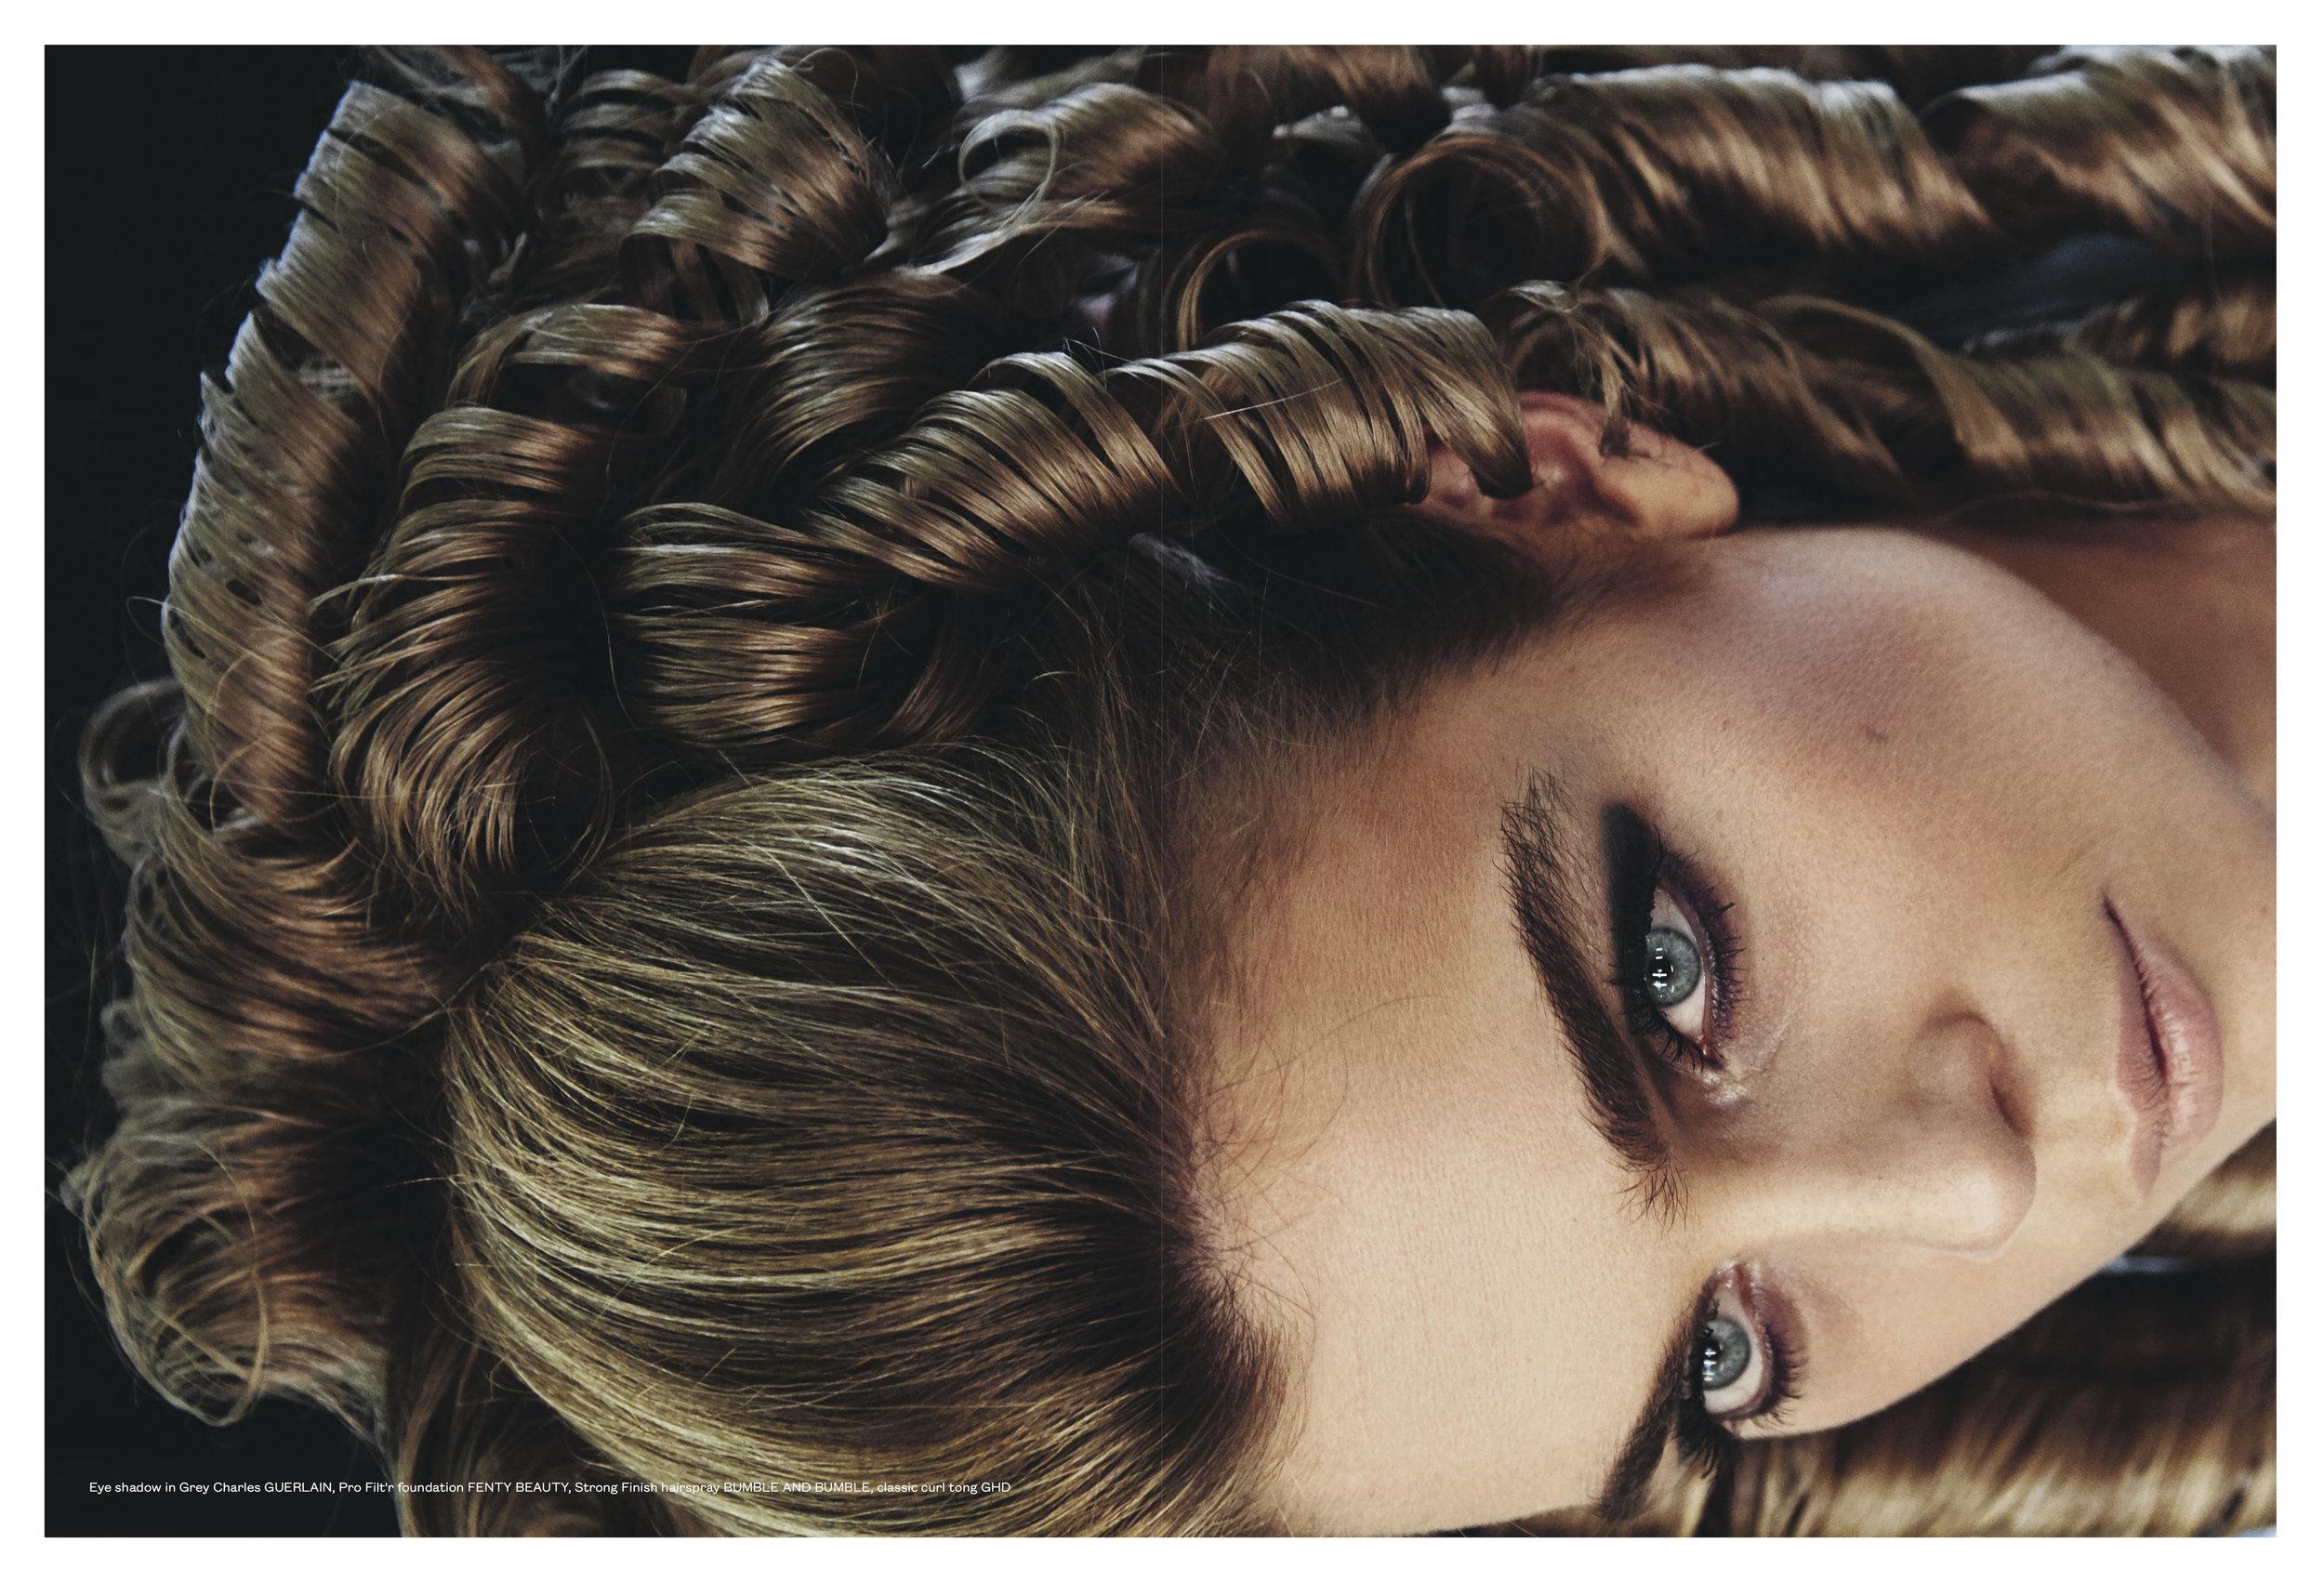 BeautyPapers#5 Mathew Kristal (dragged) 3 copy.jpg